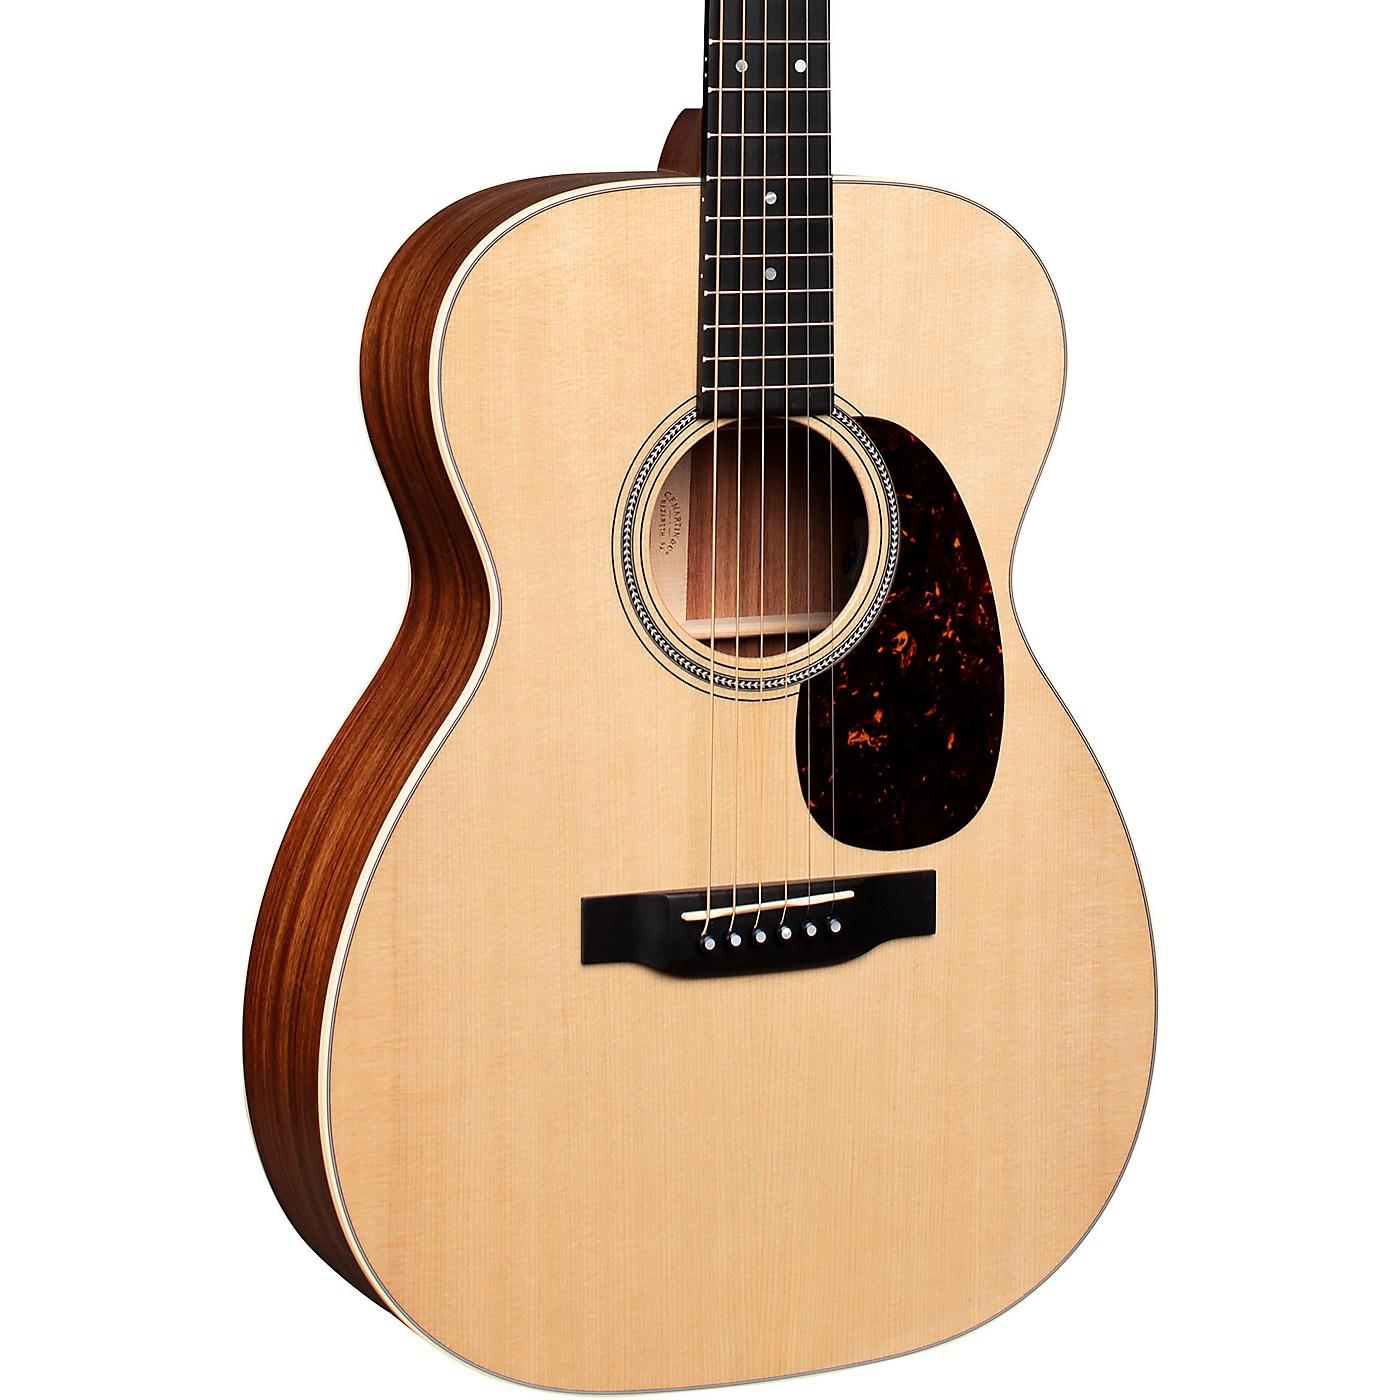 Martin 00-16E 16 Series with Granadillo Parlor Acoustic-Electric Guitar thumbnail